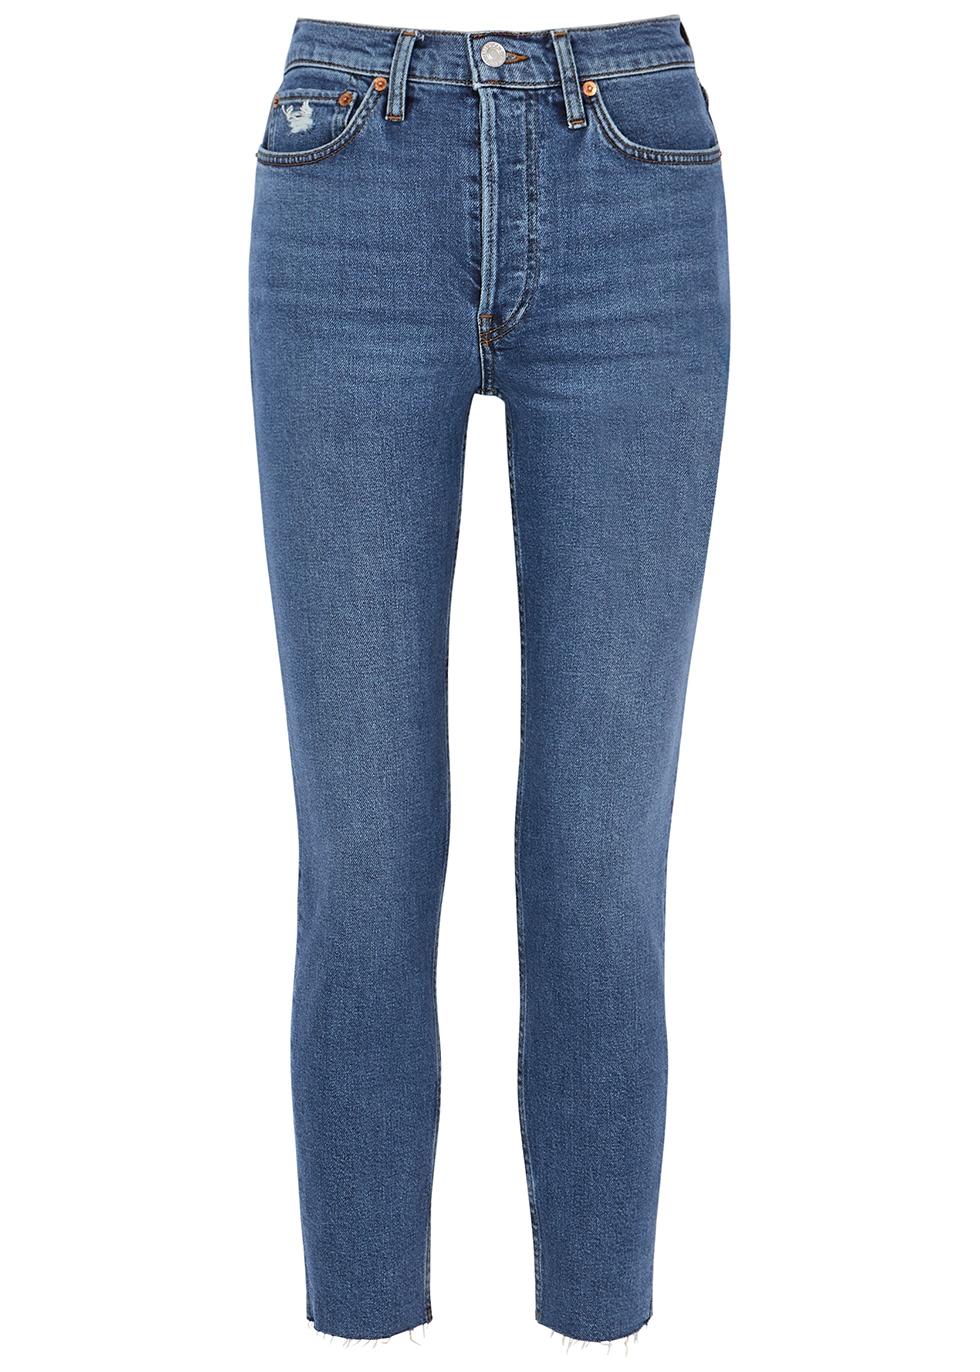 90s Comfort Stretch High Rise blue slim-leg jeans